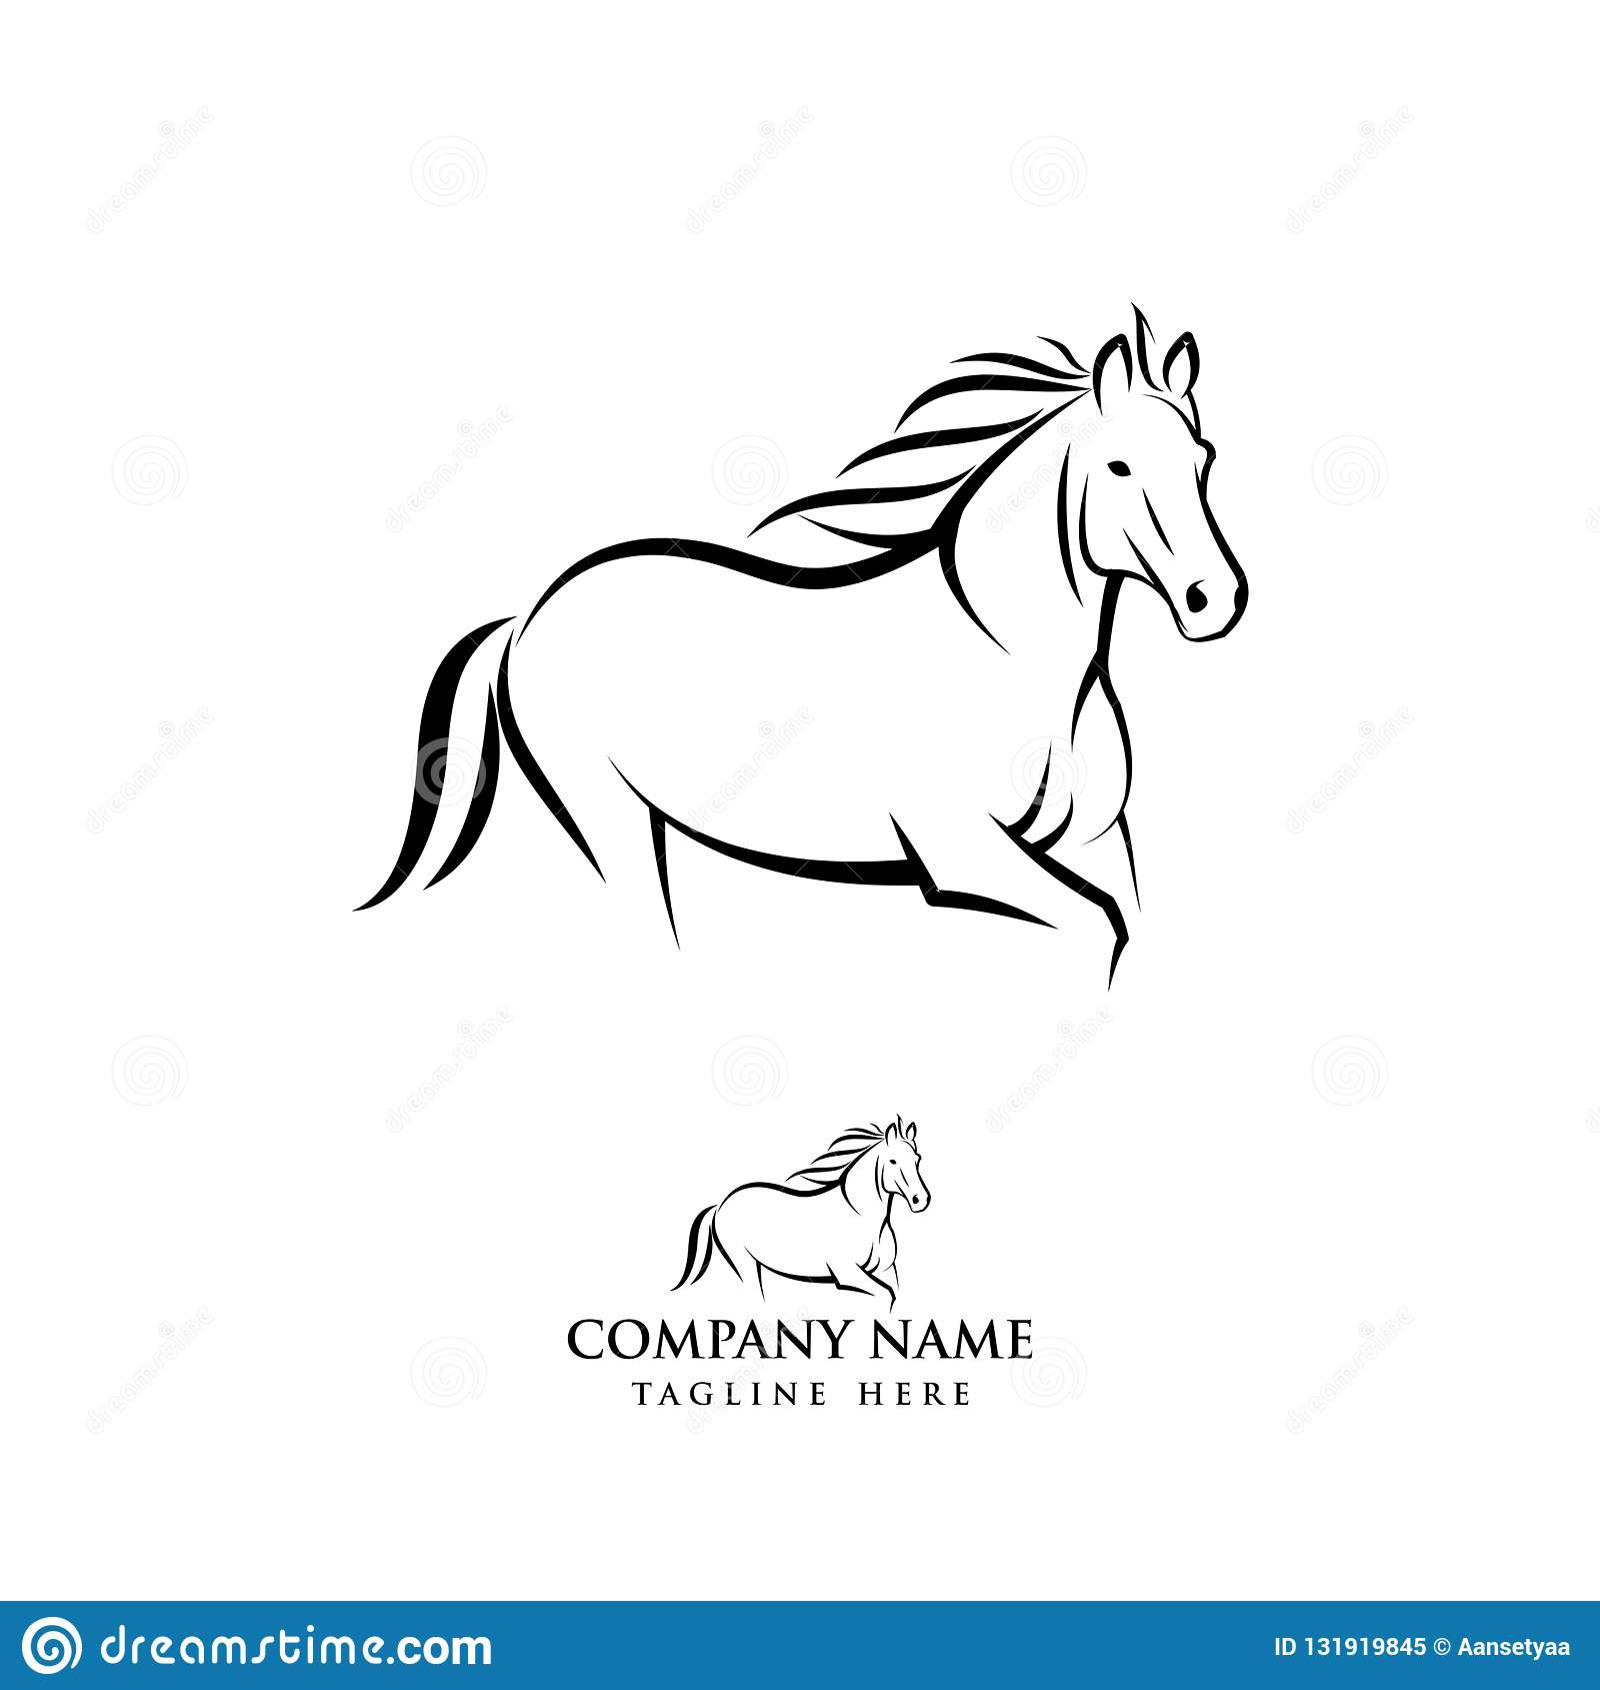 Horse Logo Design Illustration Horse Silhouette Vector Horse Vector Illustration Stock Vector Illustration Of Equestrian Beautiful 131919845